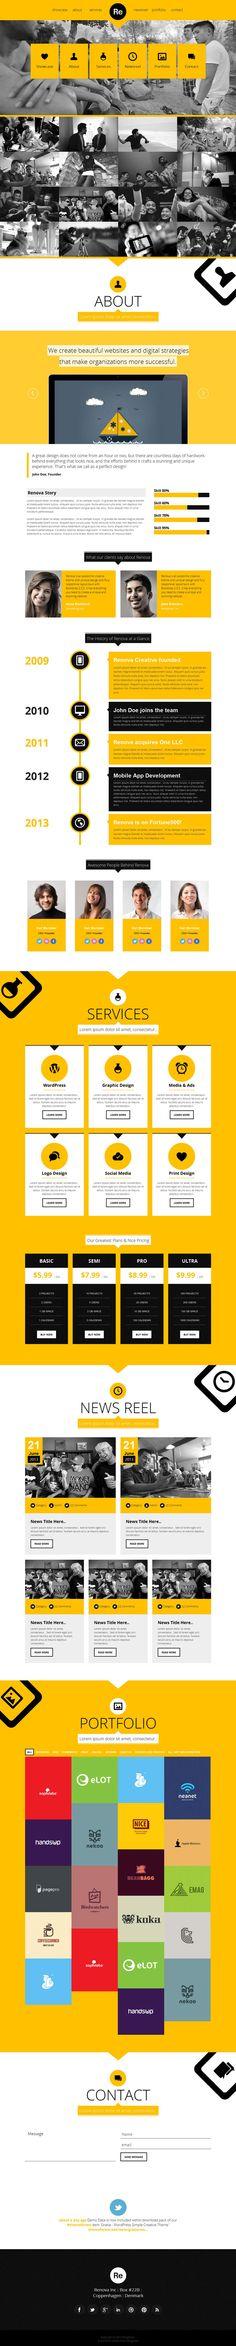 renova-one-page-responsive-portfolio - http://goo.gl/pUL3ZZ